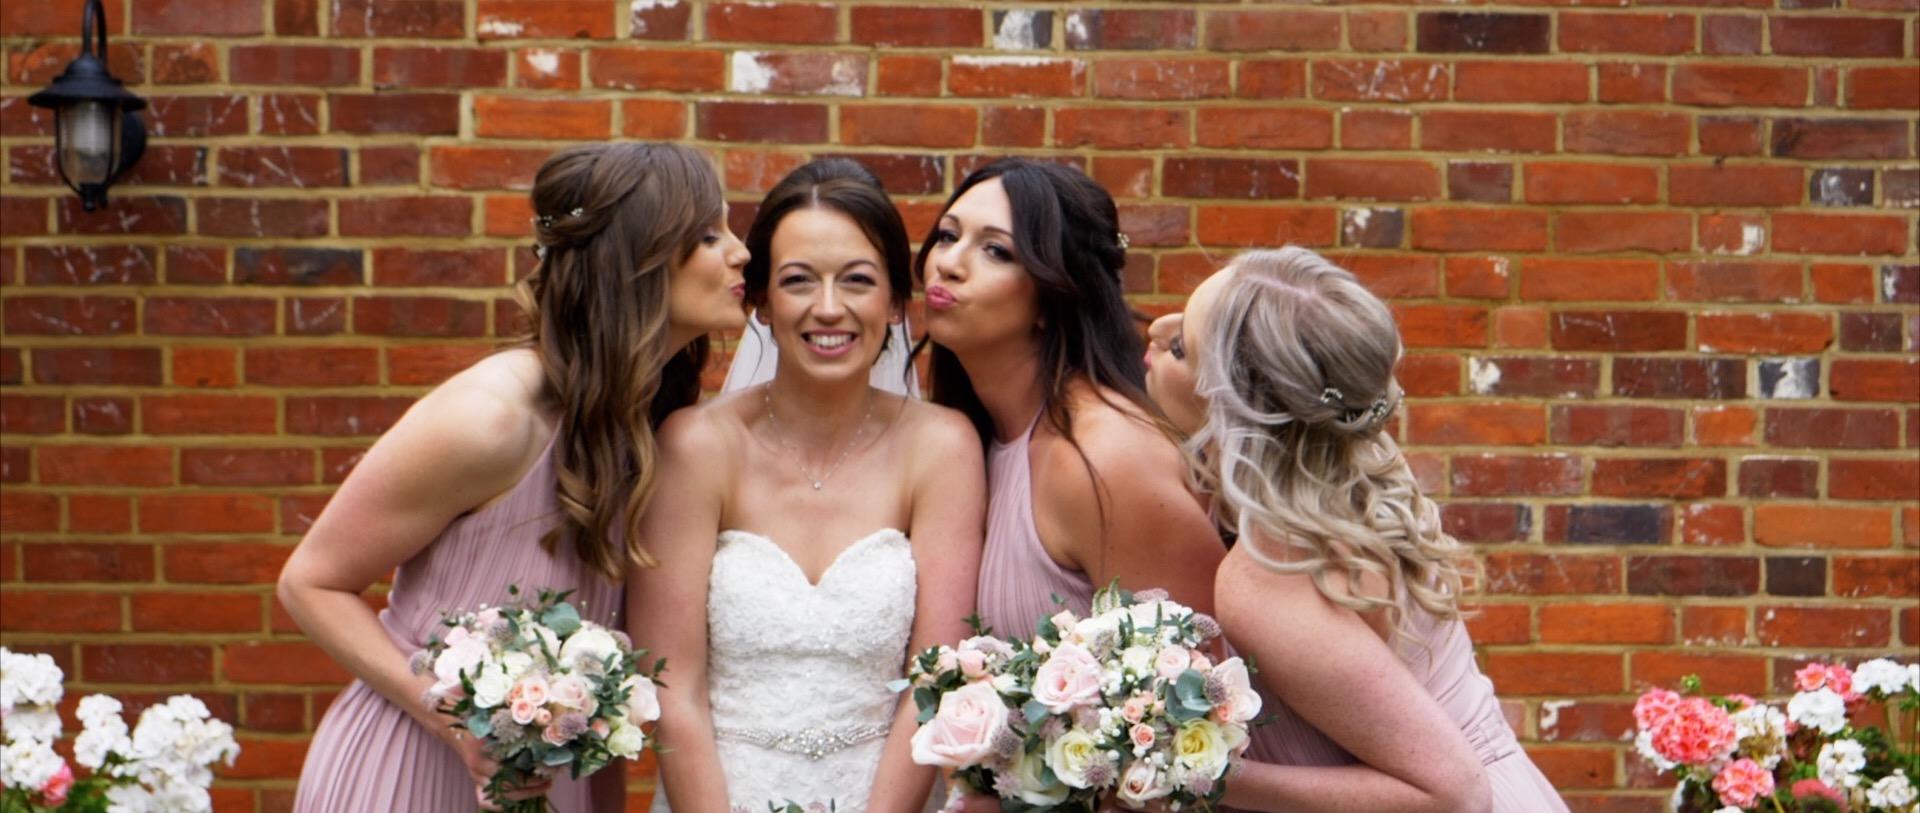 The Bride and Bridesmaids at Apton Hall weddings .jpg